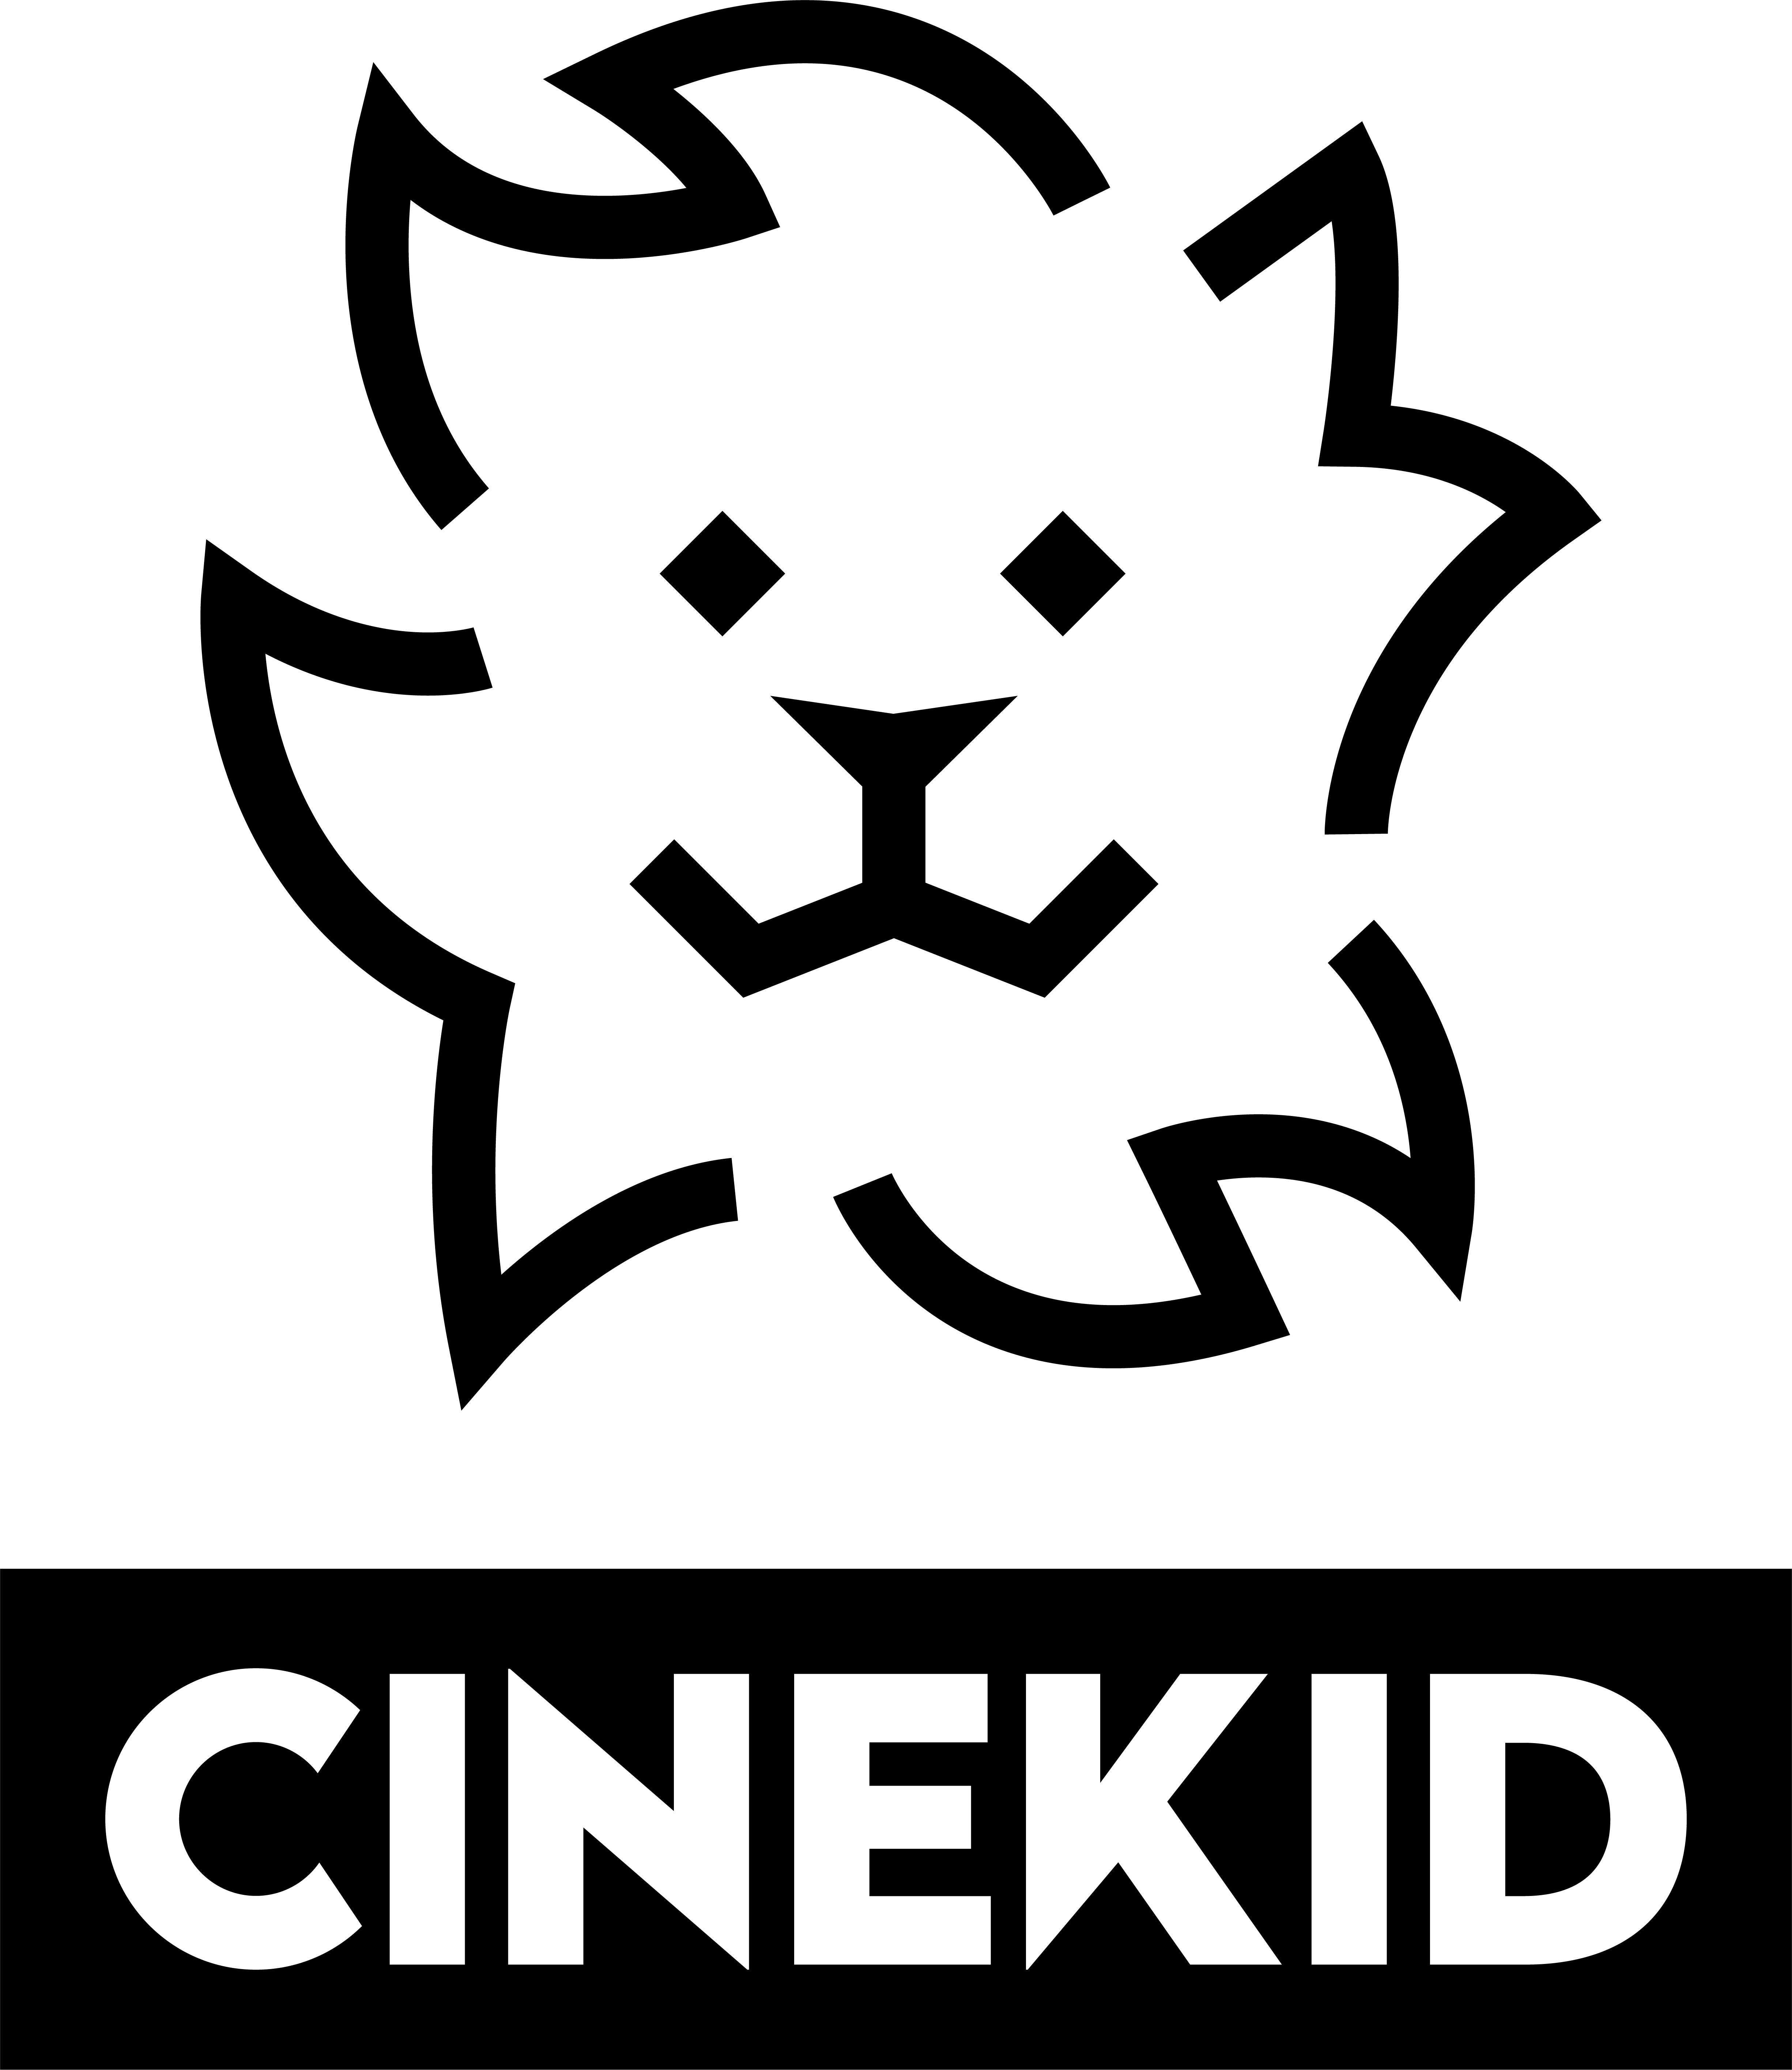 Logo_Leo_Cinekid_Zwart_CMYK.jpg